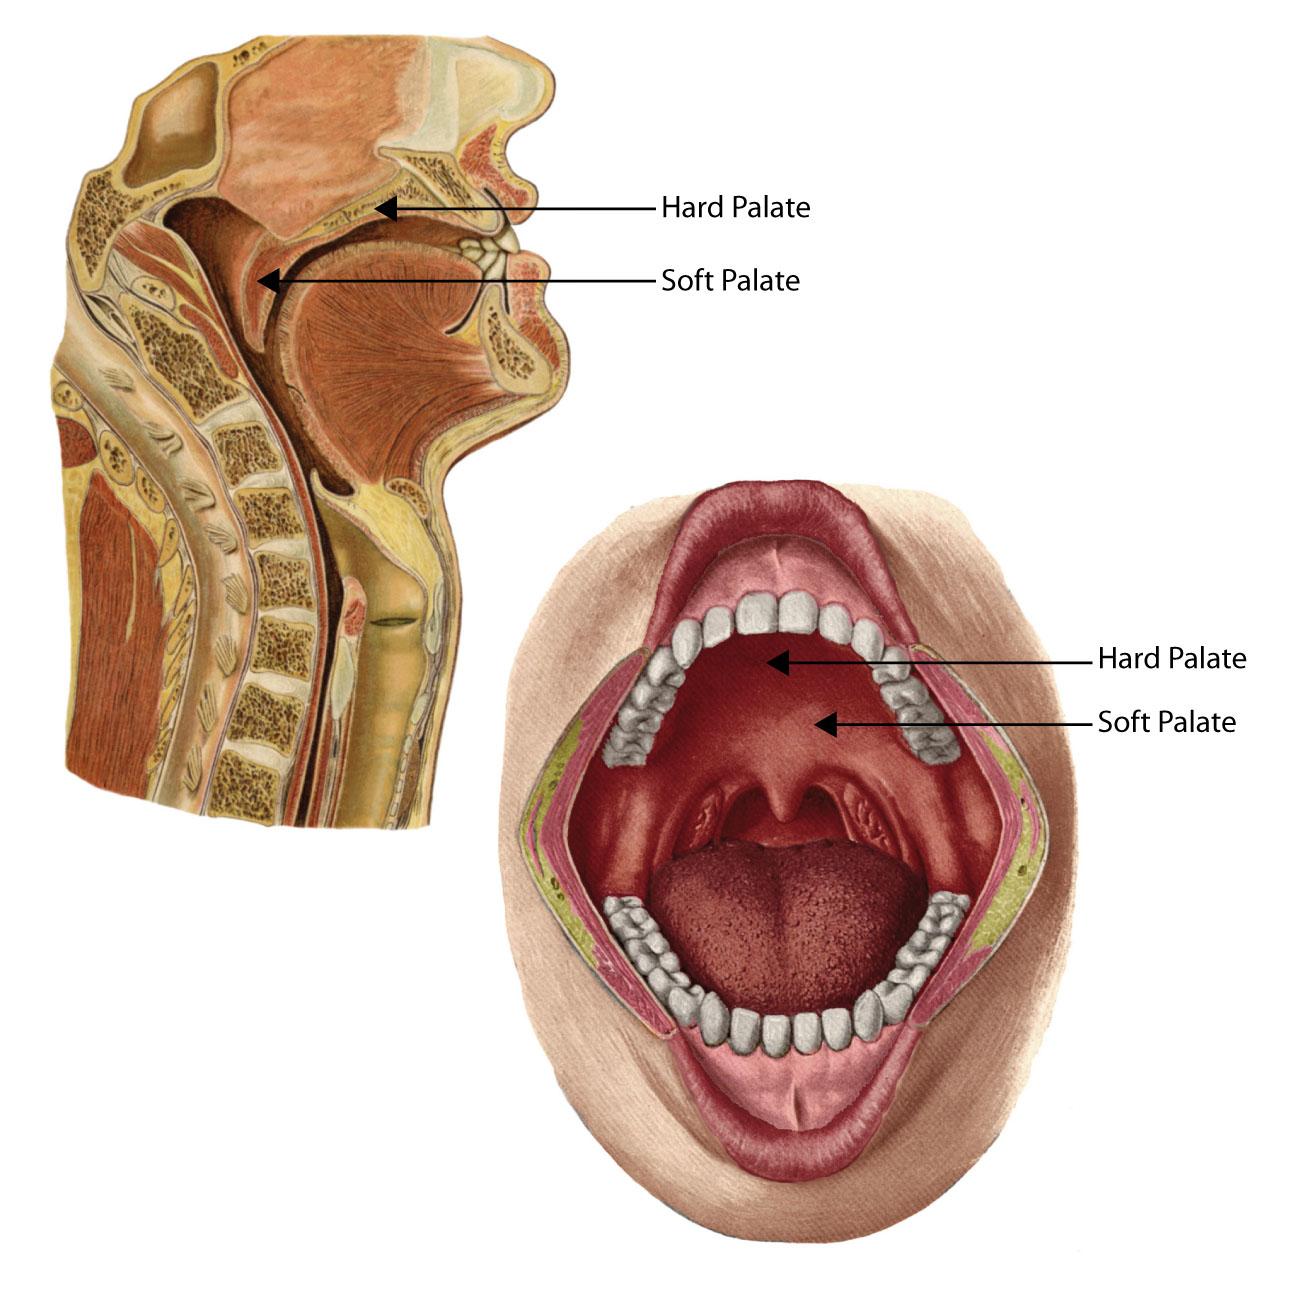 anatomyEXPERT - Soft palate - Structure Detail